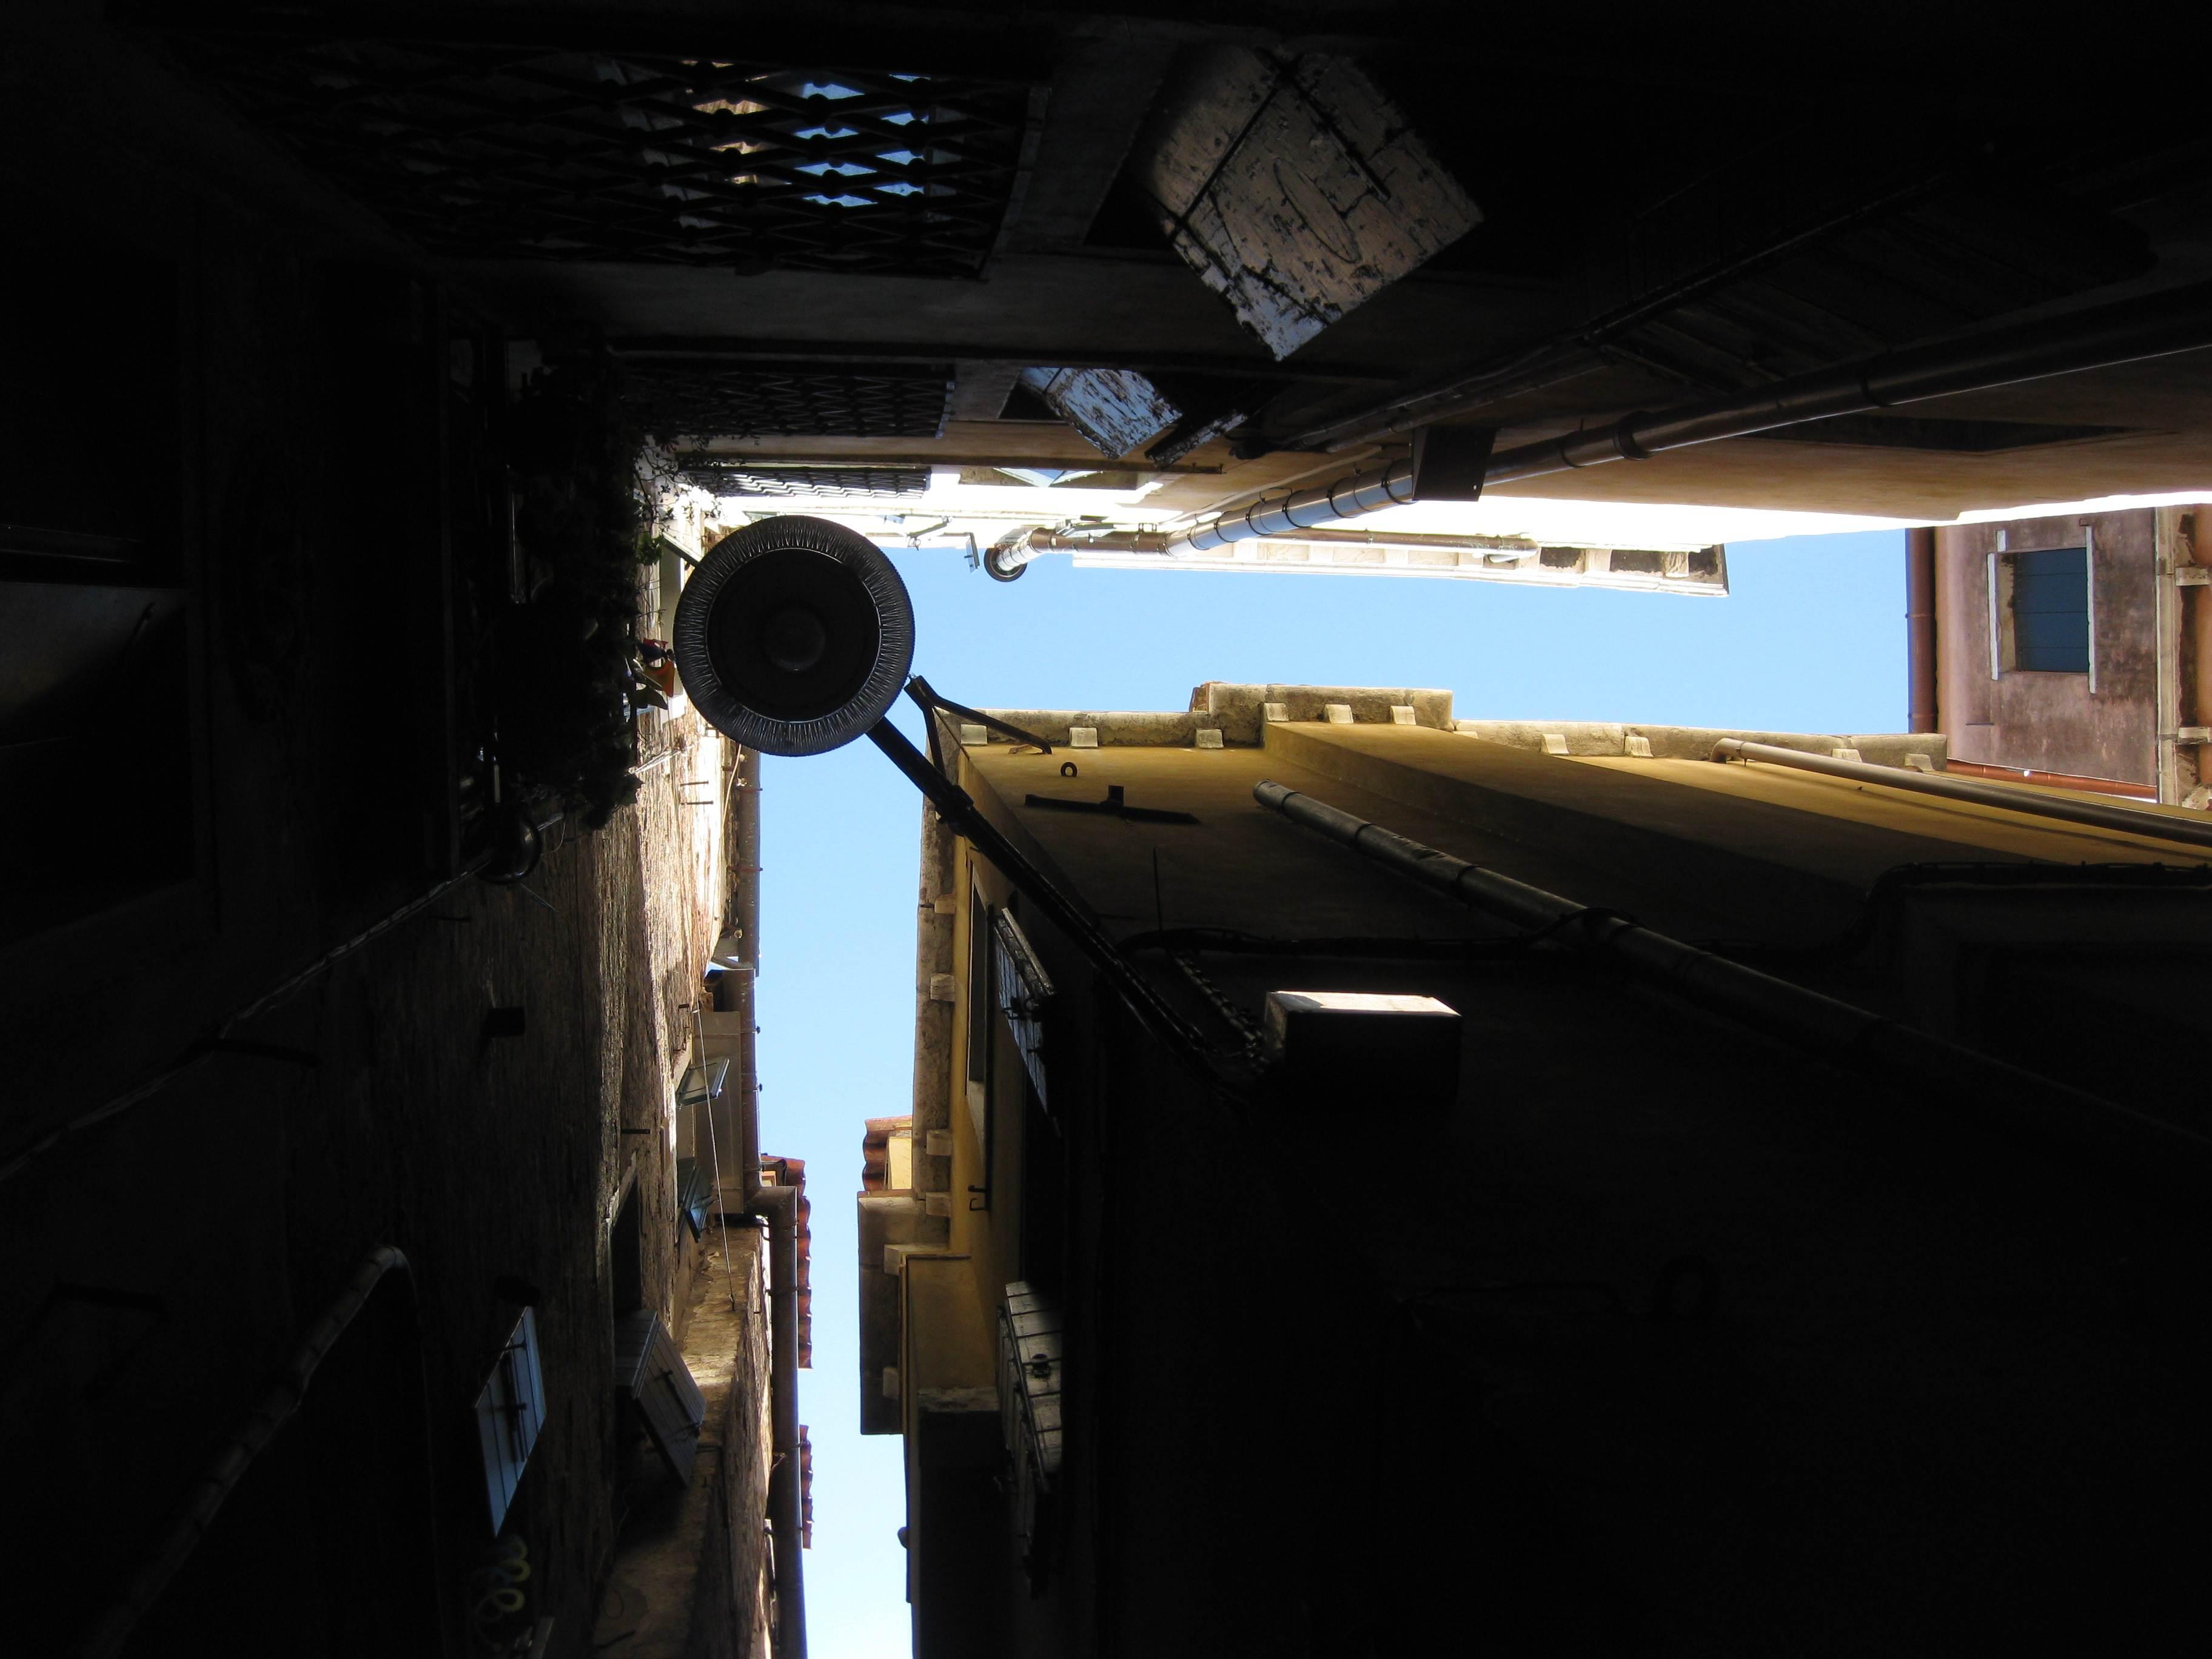 Alleyways in Venice